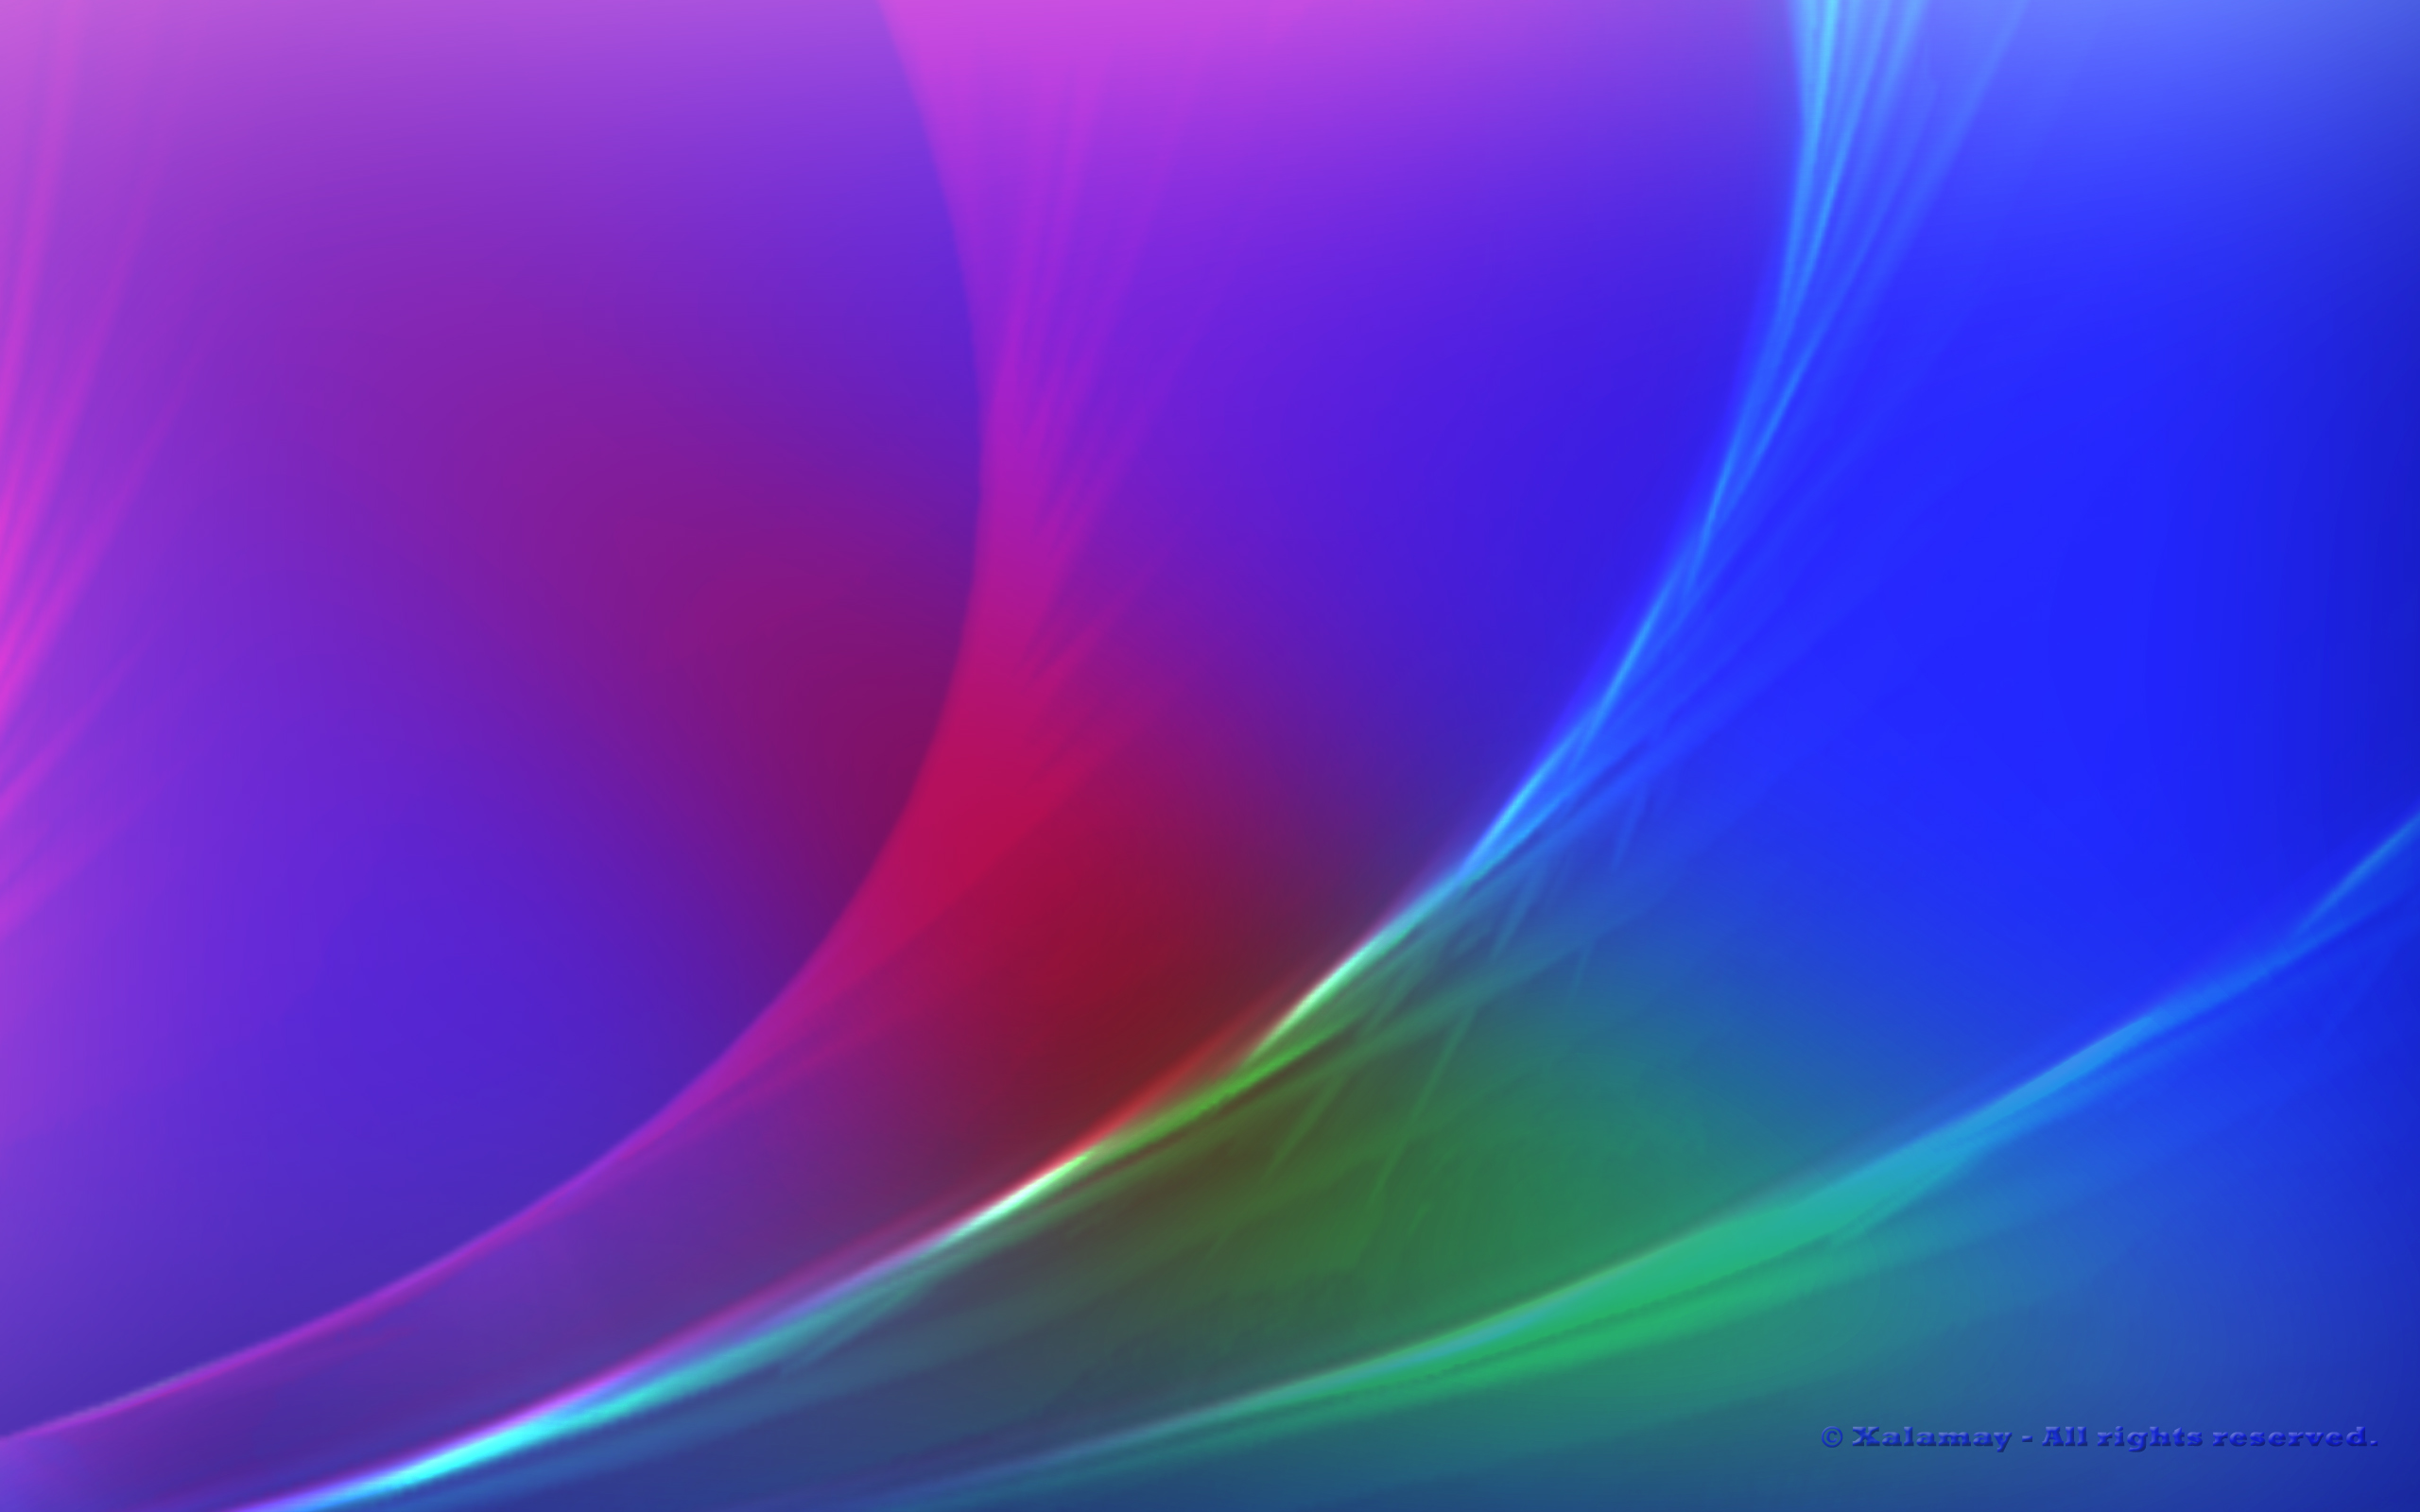 Abstract Unique Desktop Wallpaper